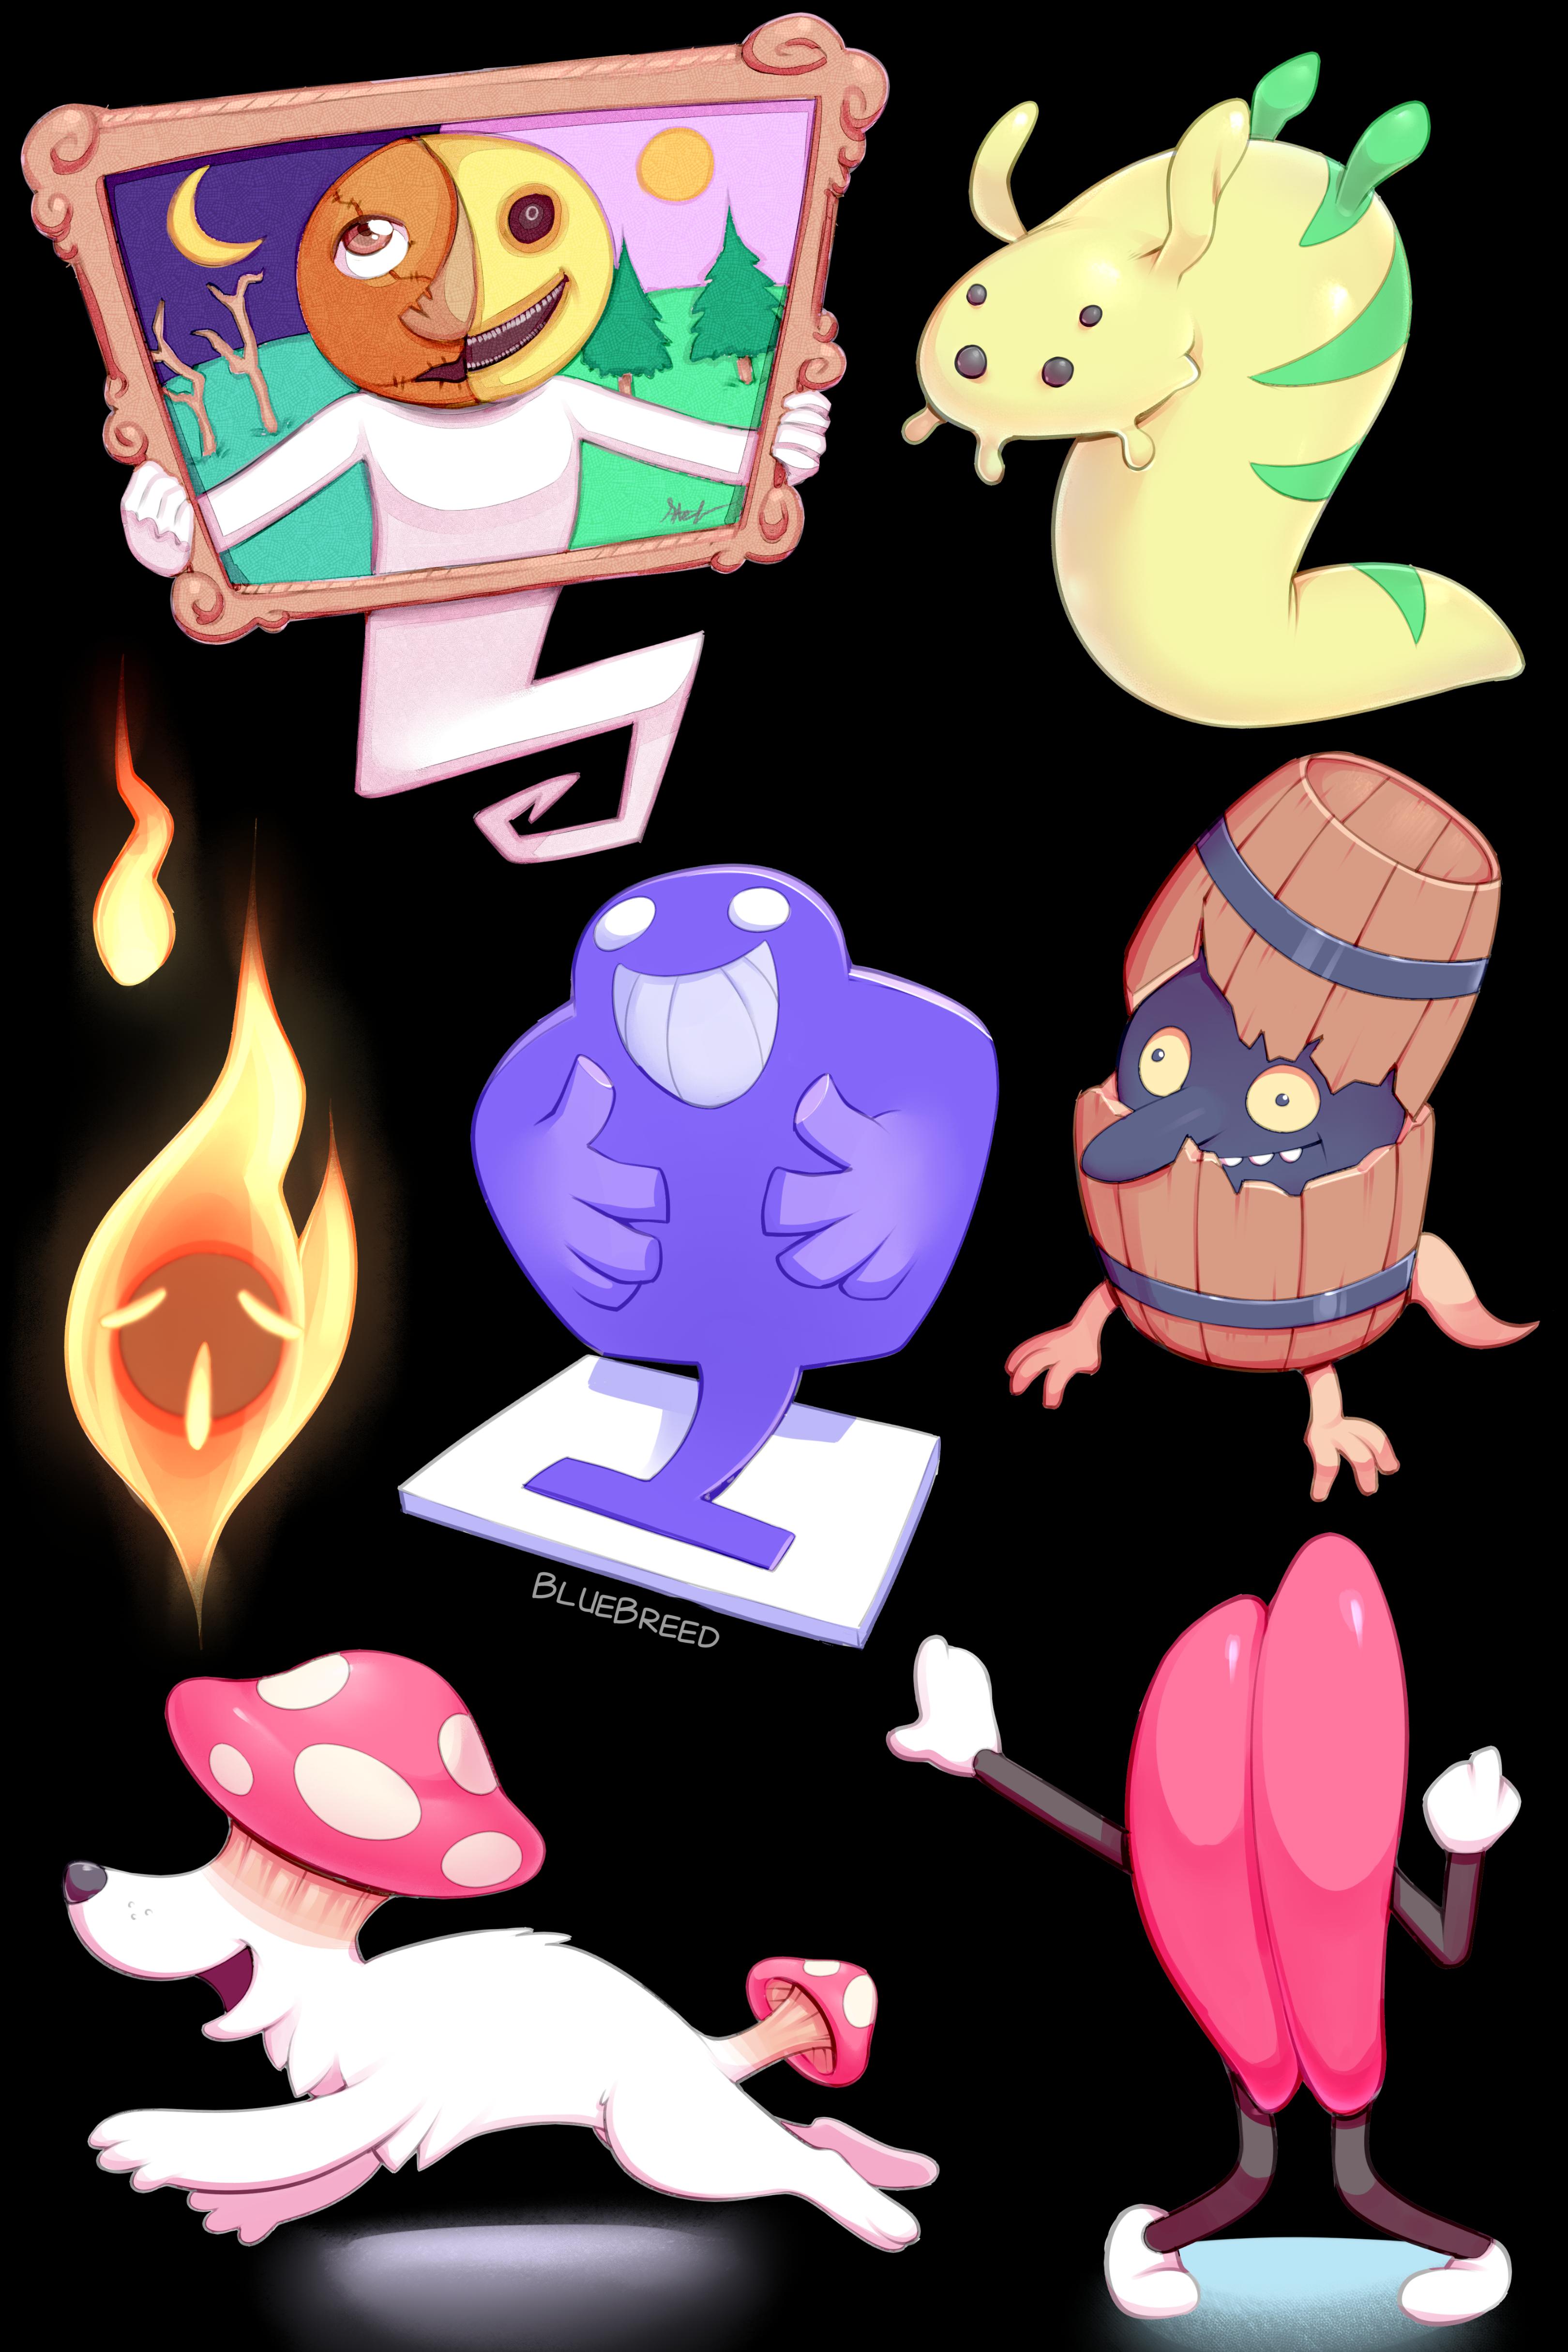 Mother 3 Enemy Doodles